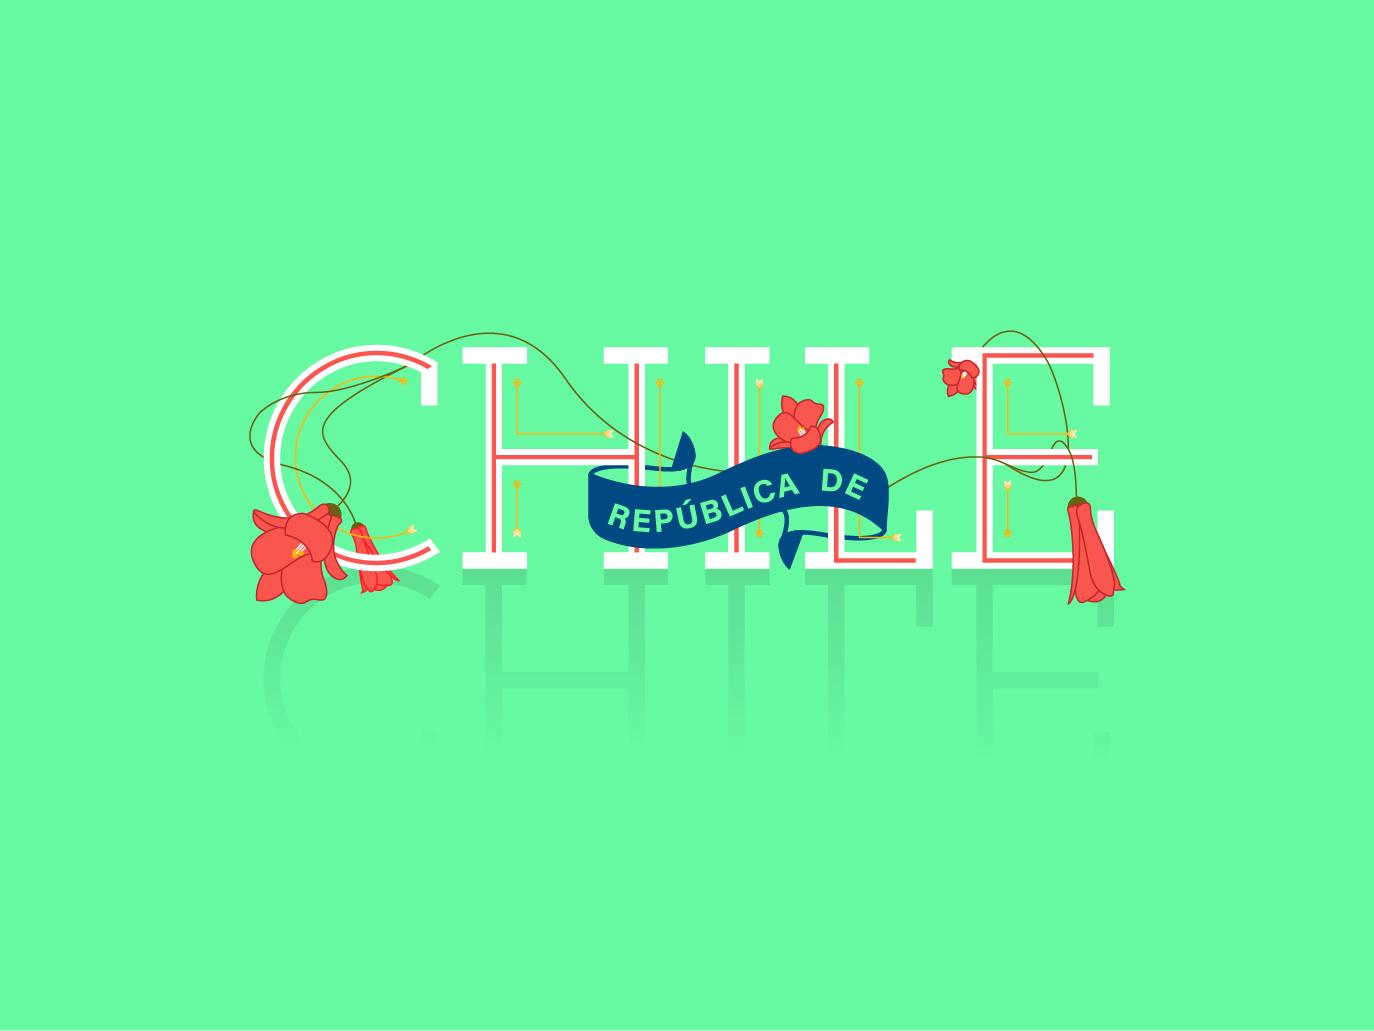 República de Chile type design chile badge logo illustration typography vector design